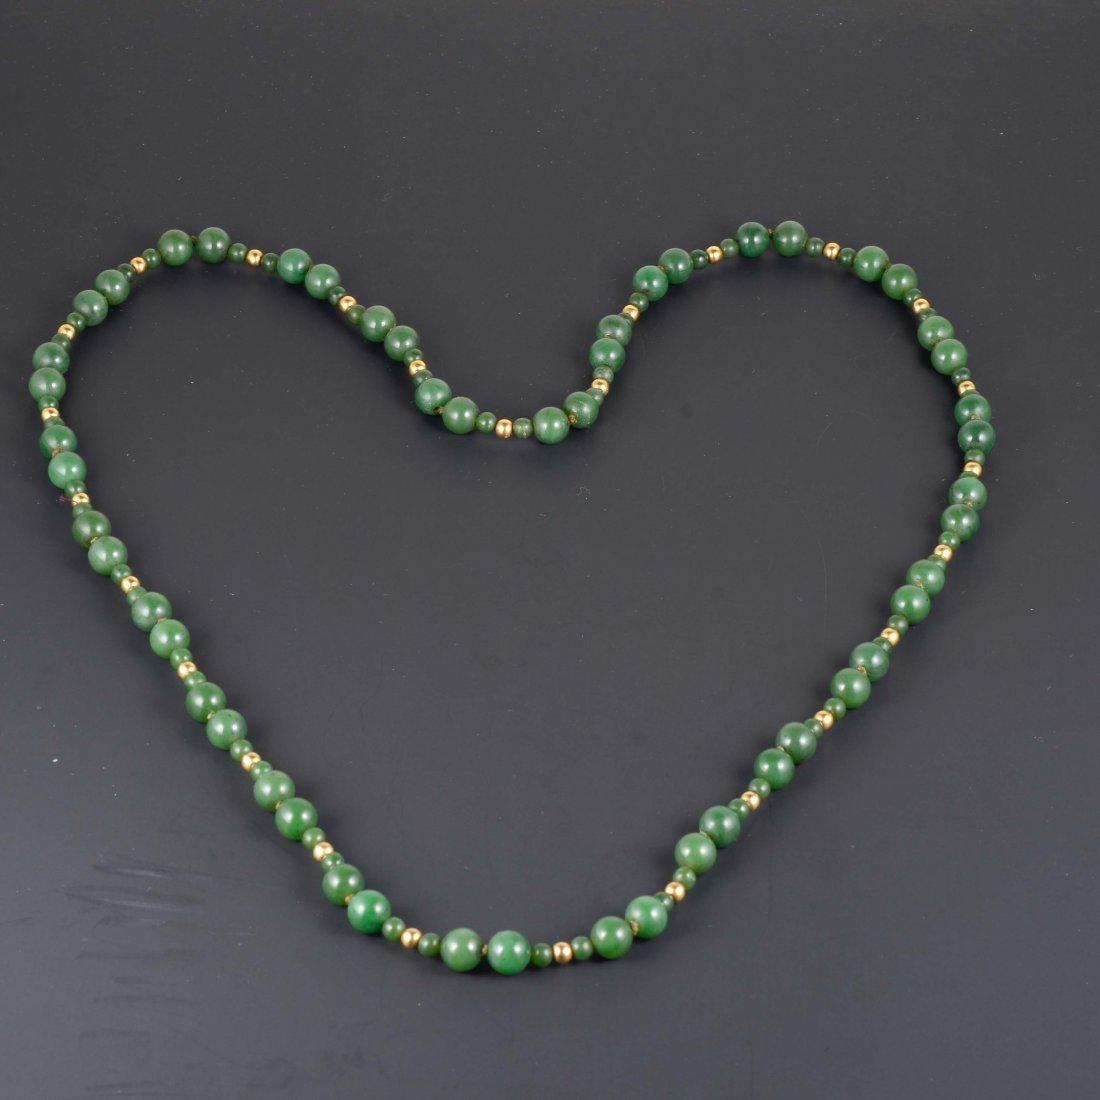 14K YG Jade Beads Necklace